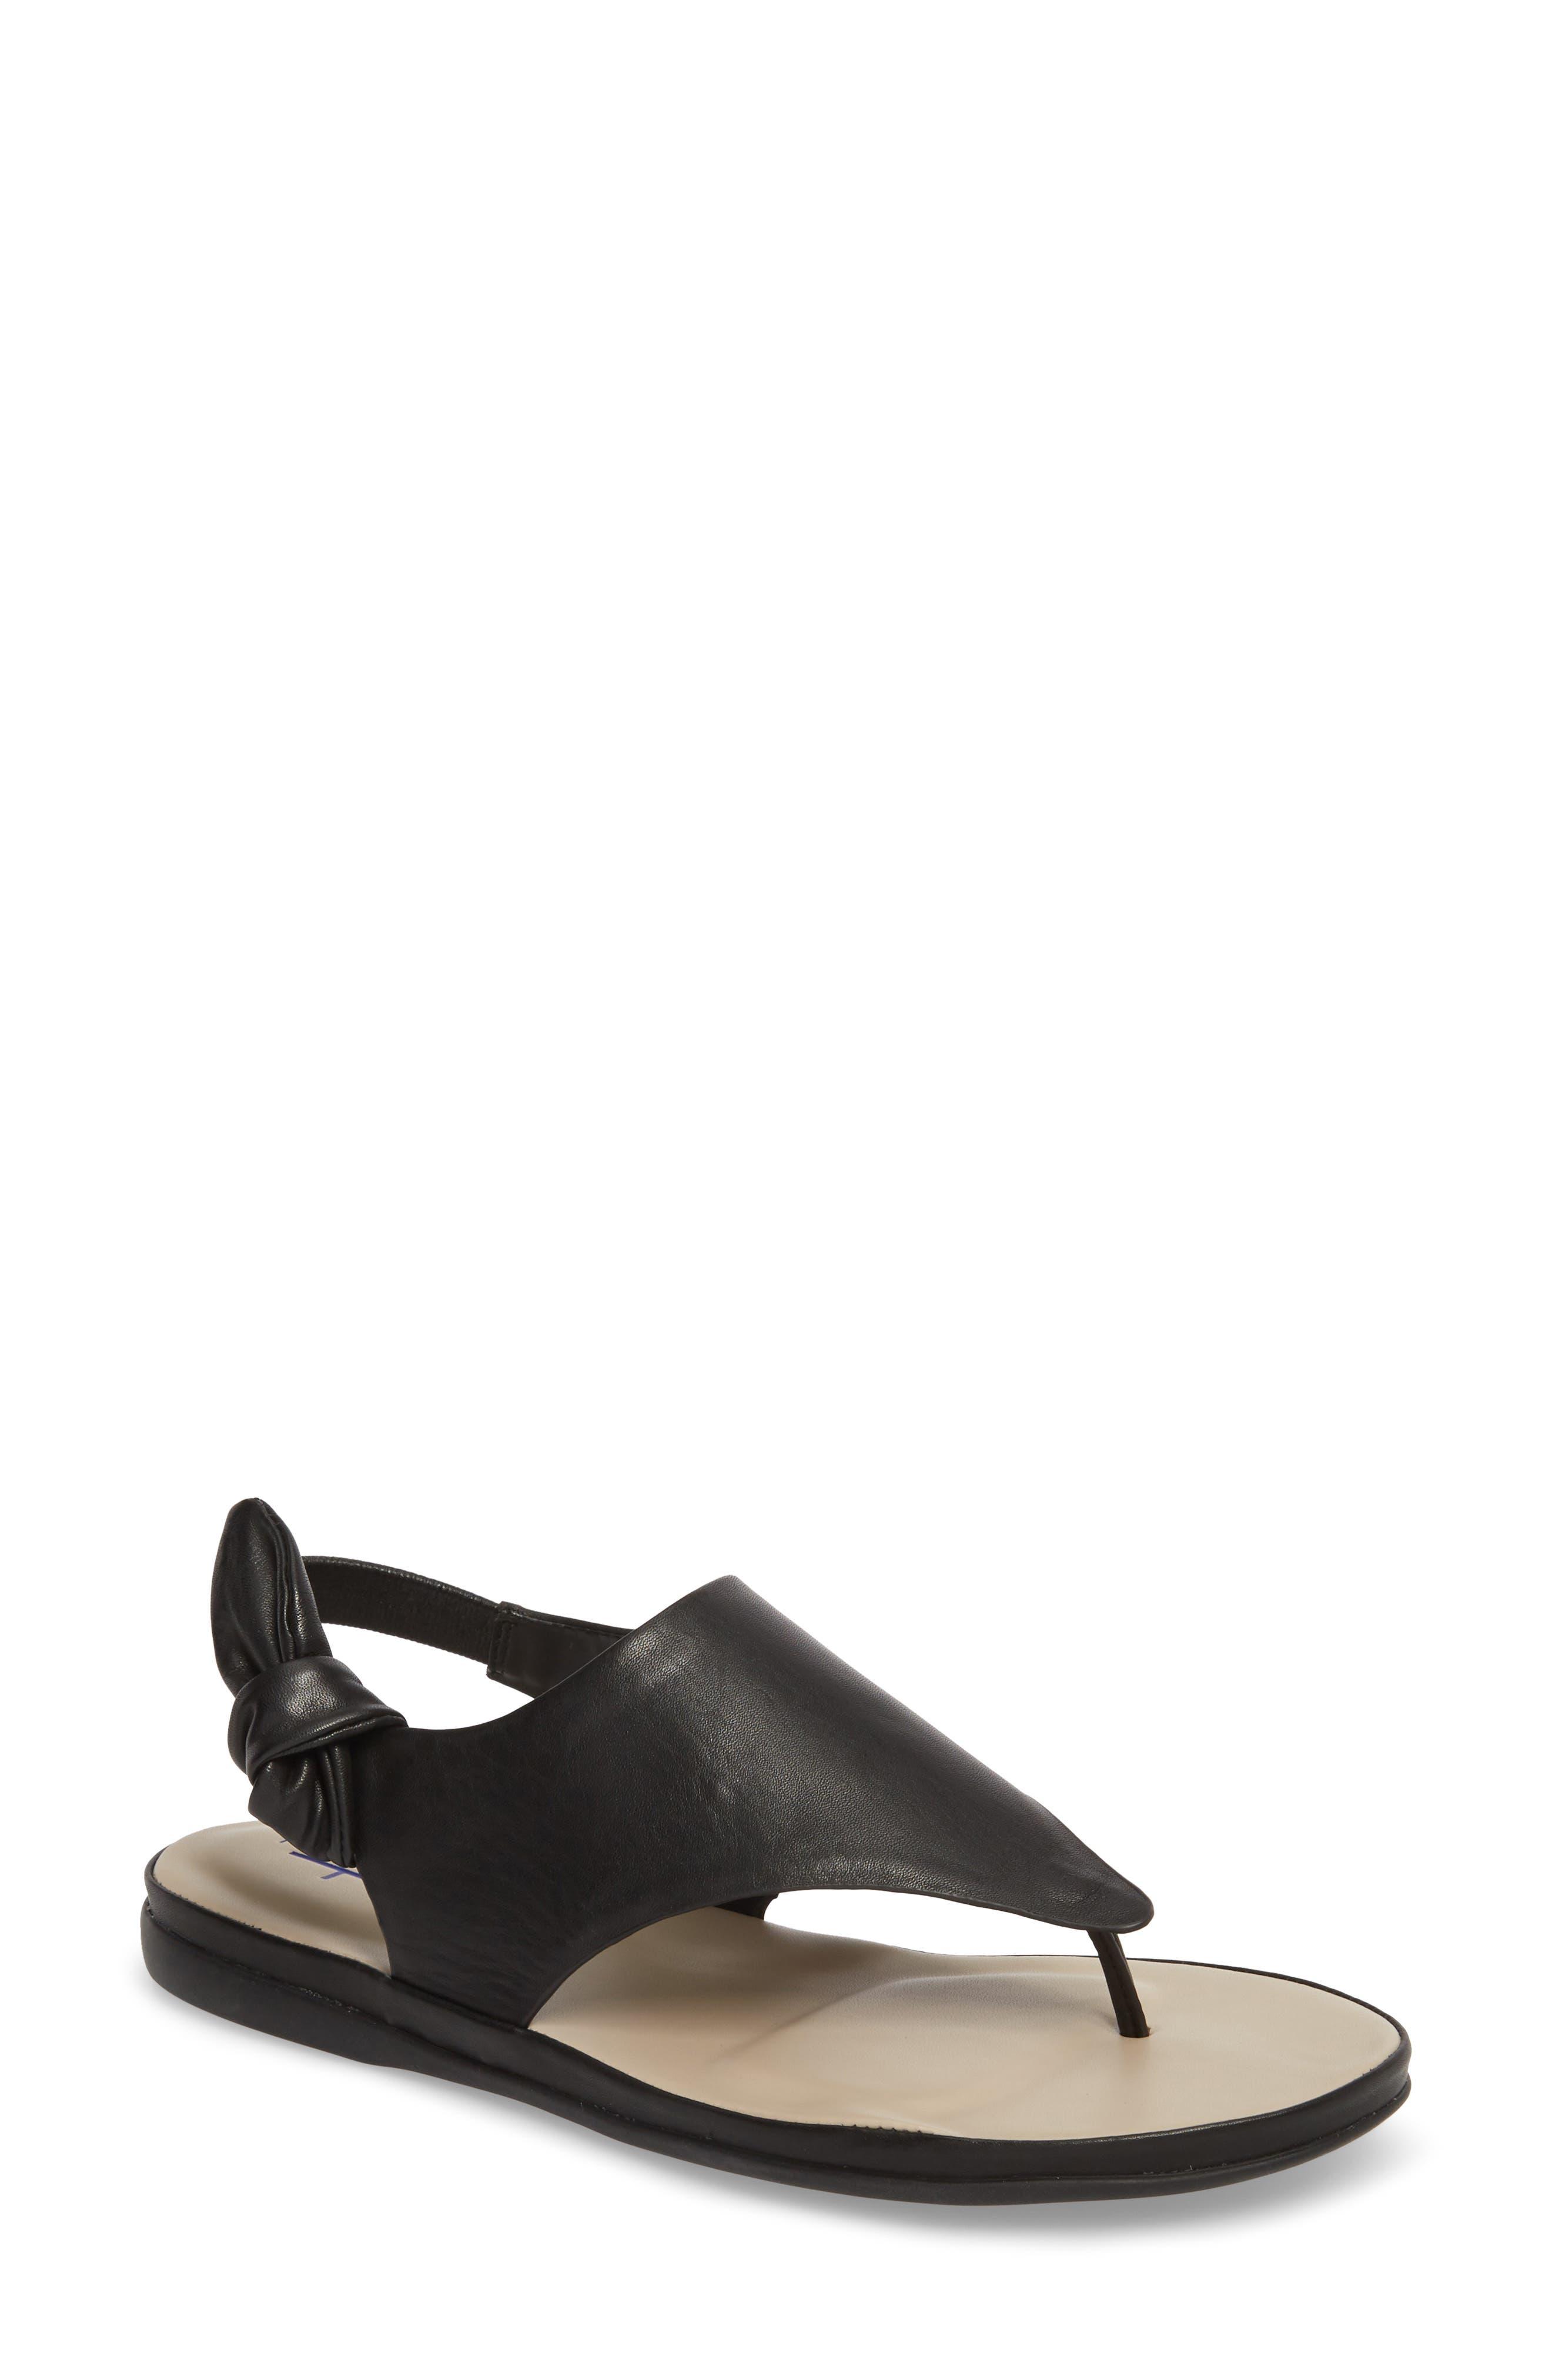 Aleena Sandal,                         Main,                         color, Black Leather